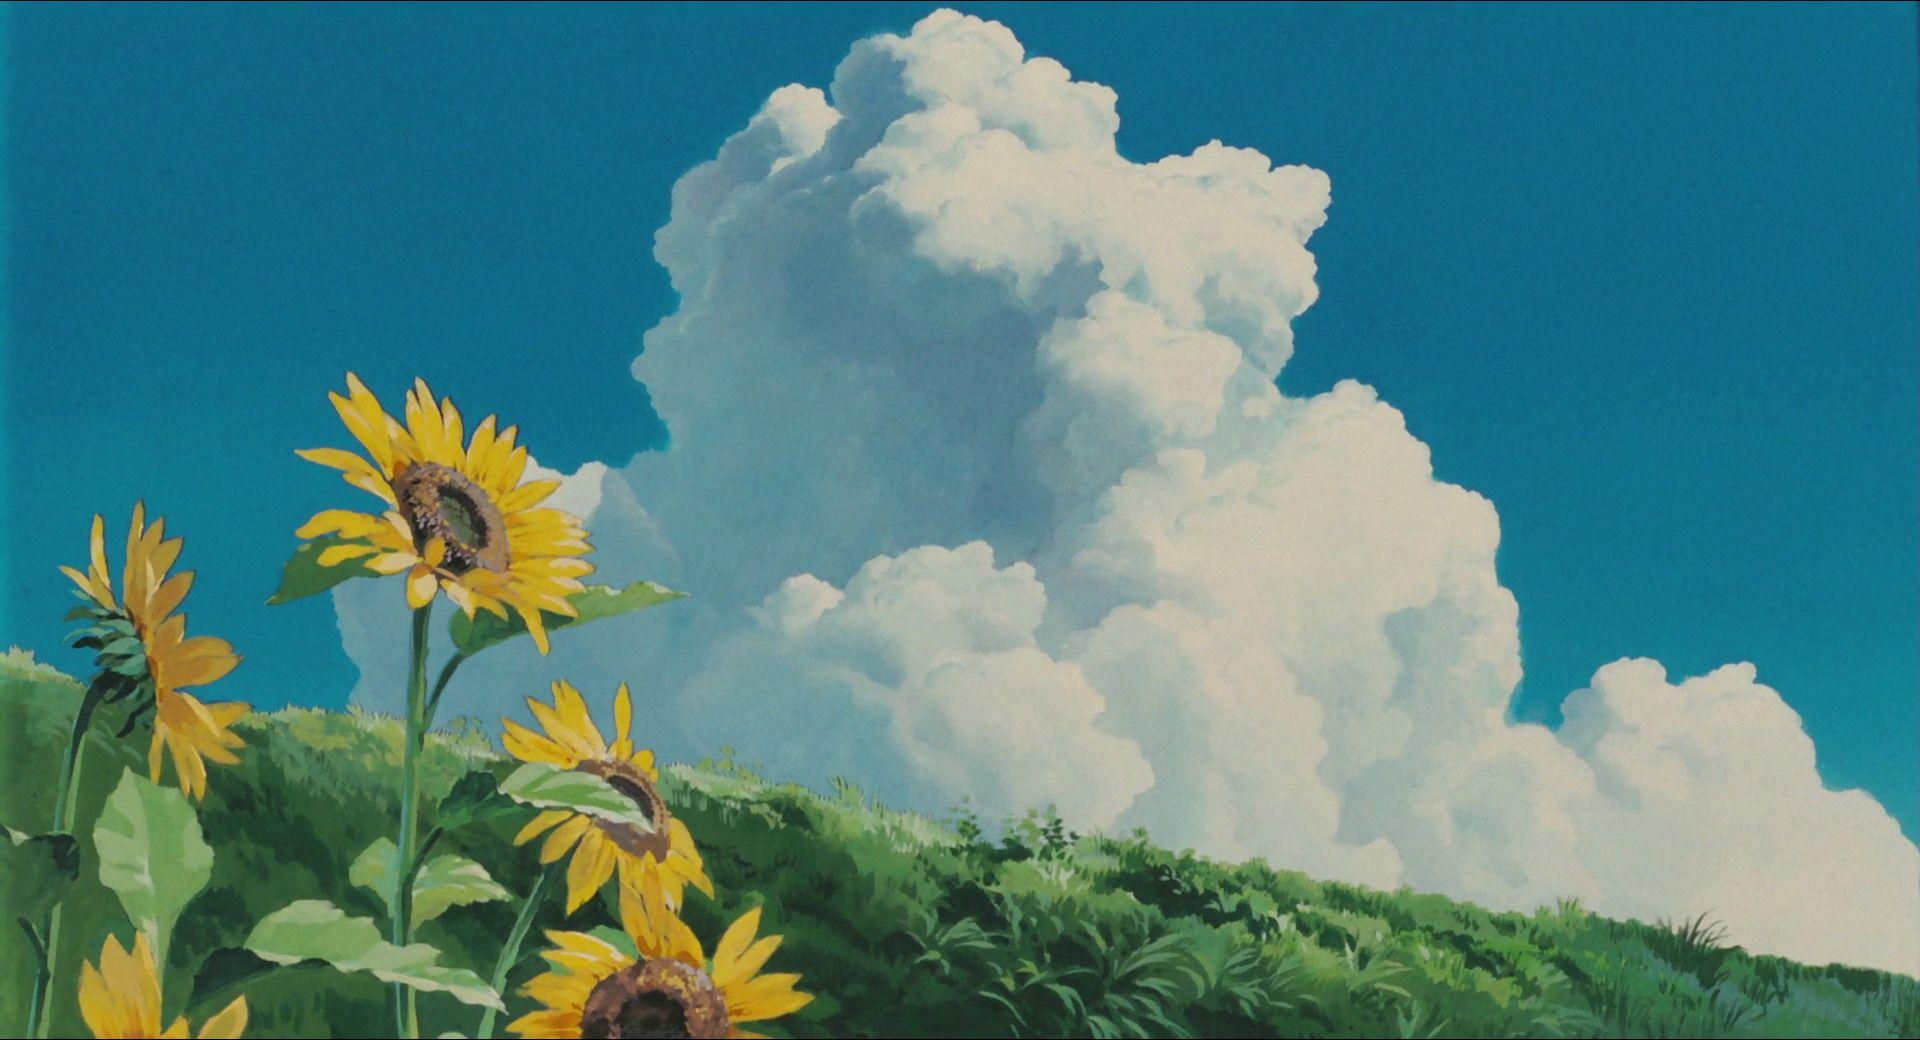 My Neighbor Totoro (1988) - Animation Screencaps